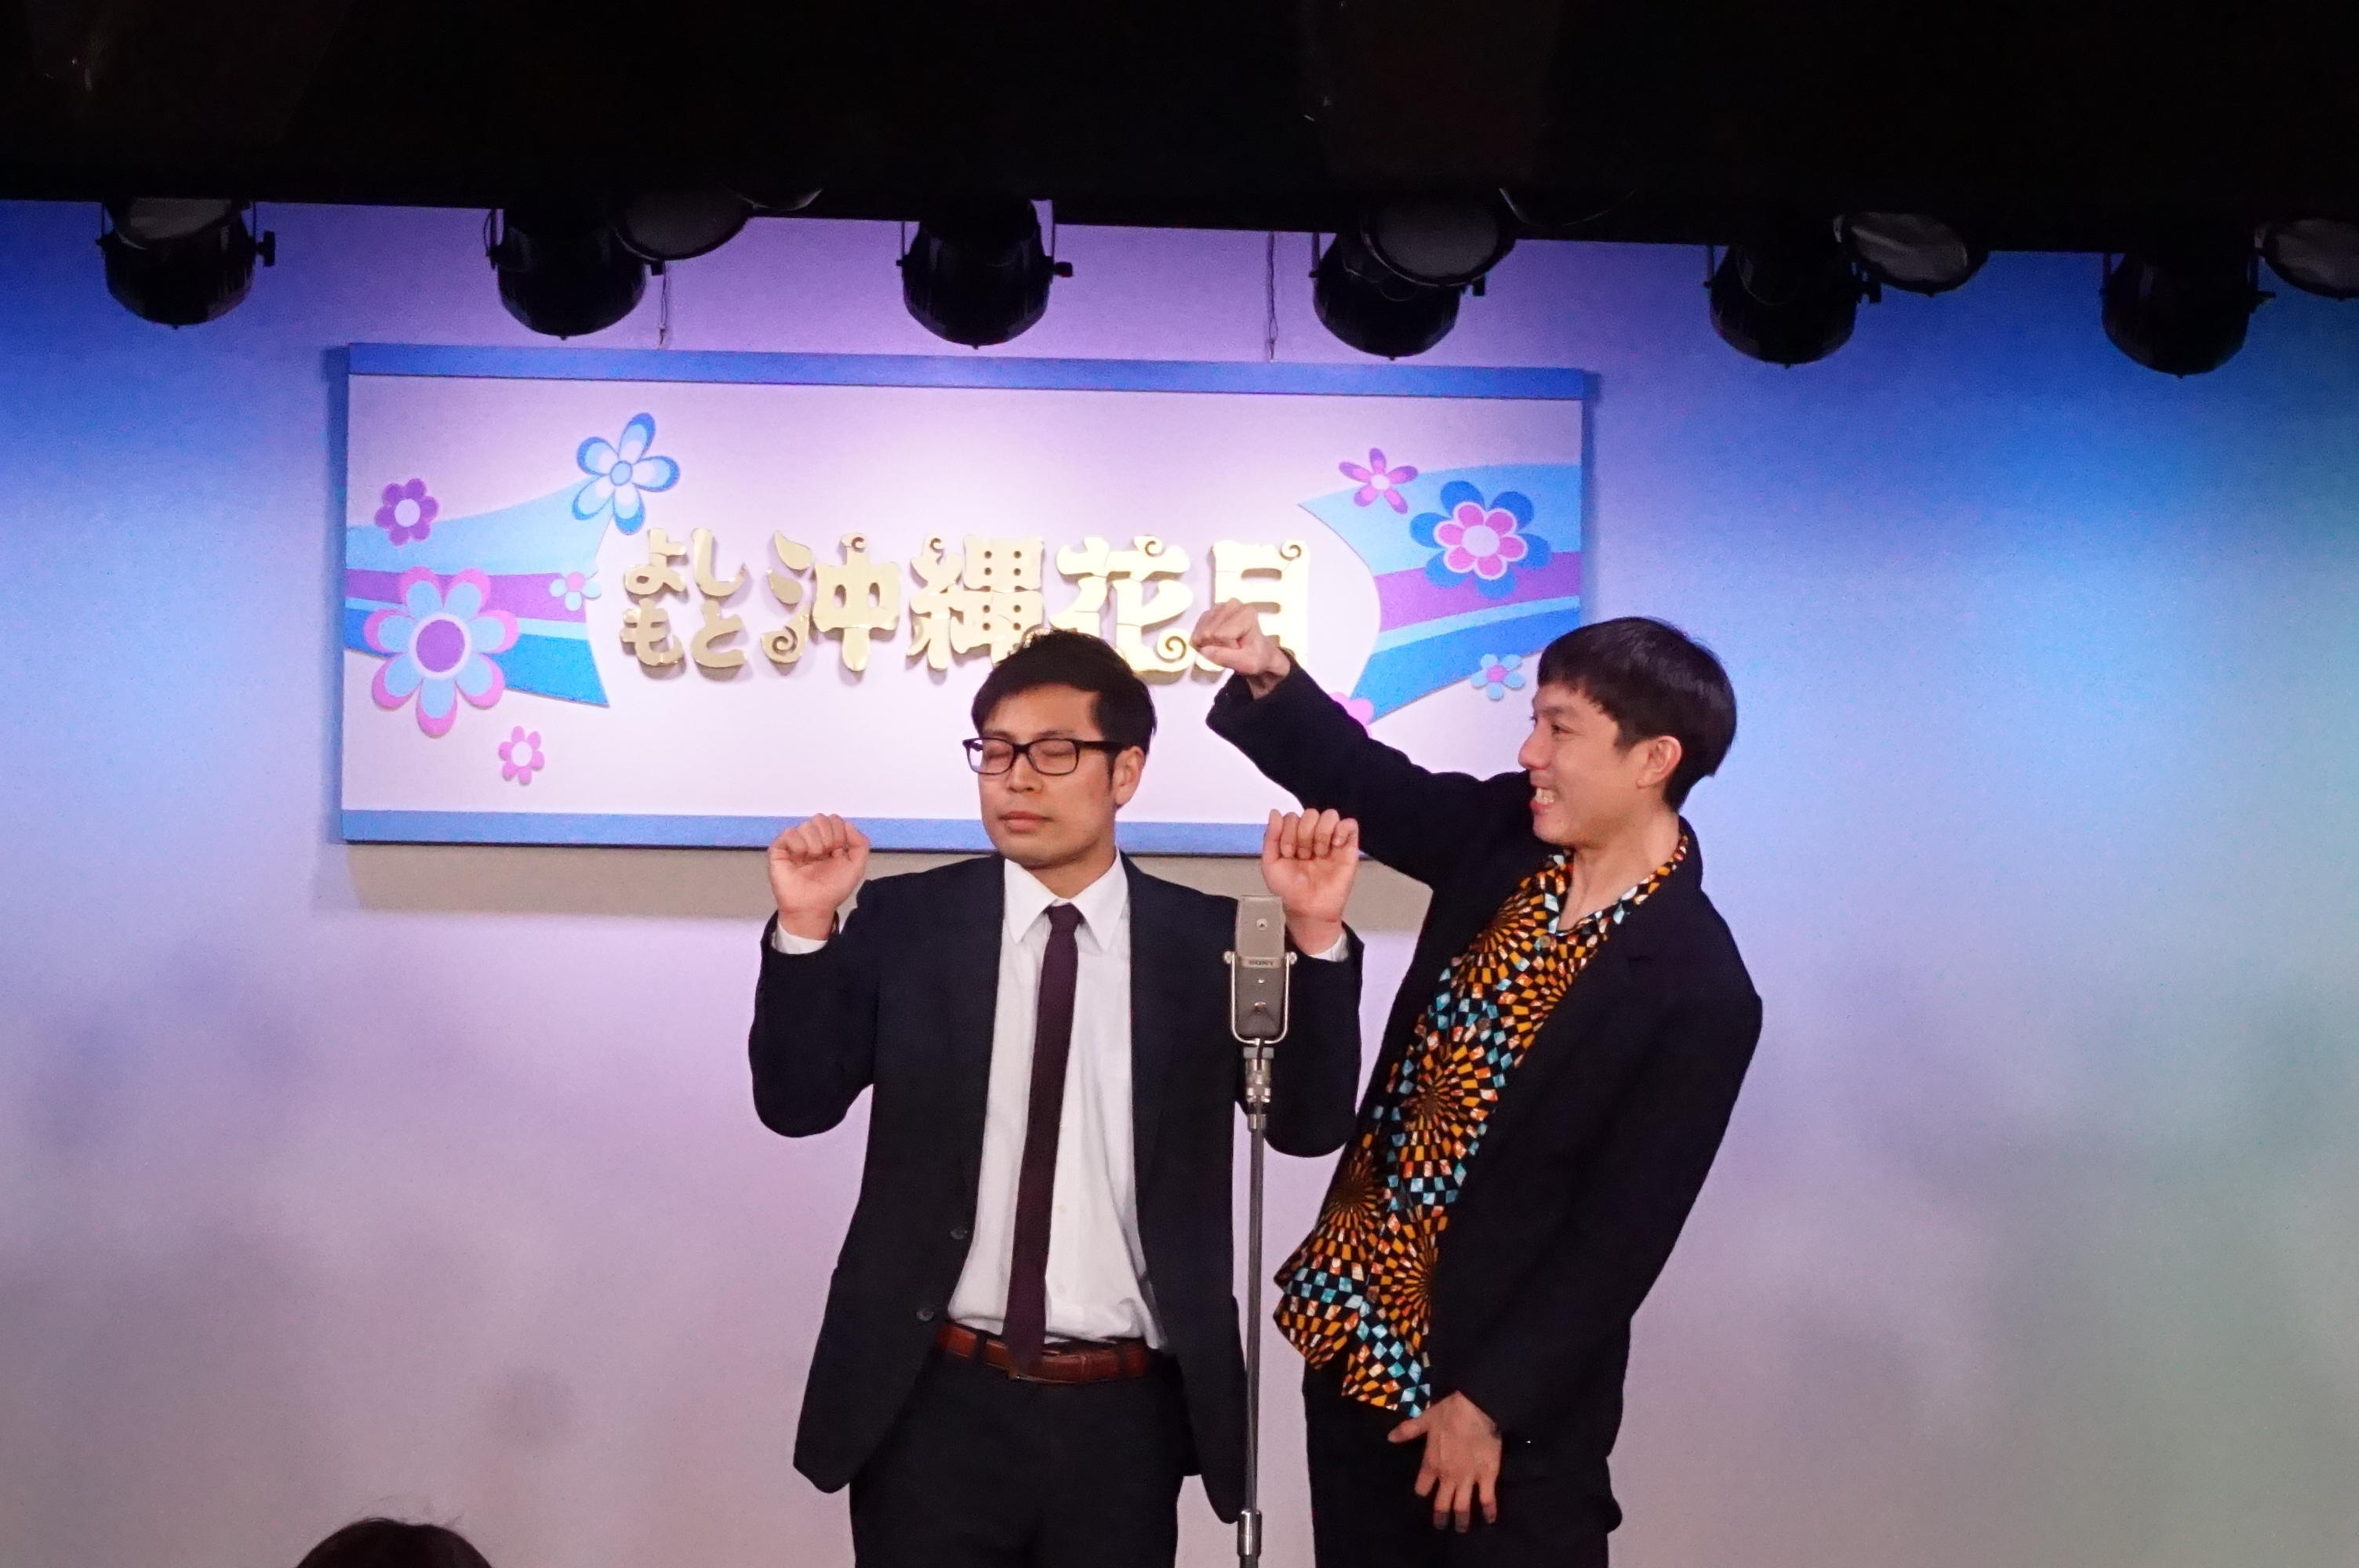 http://news.yoshimoto.co.jp/20180330150508-95319eae9ae3b9a12e929e13318685599ef96253.jpg